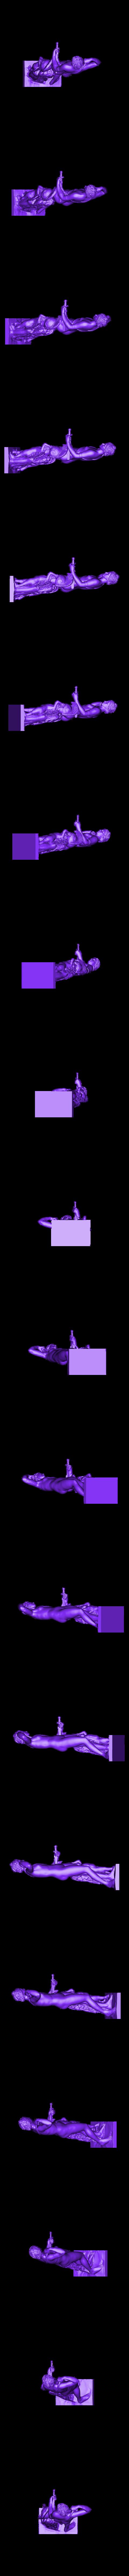 louvre-venus-in-arms-1.stl Download free STL file Venus in Arms at The Louvre, Paris • 3D printable template, Louvre